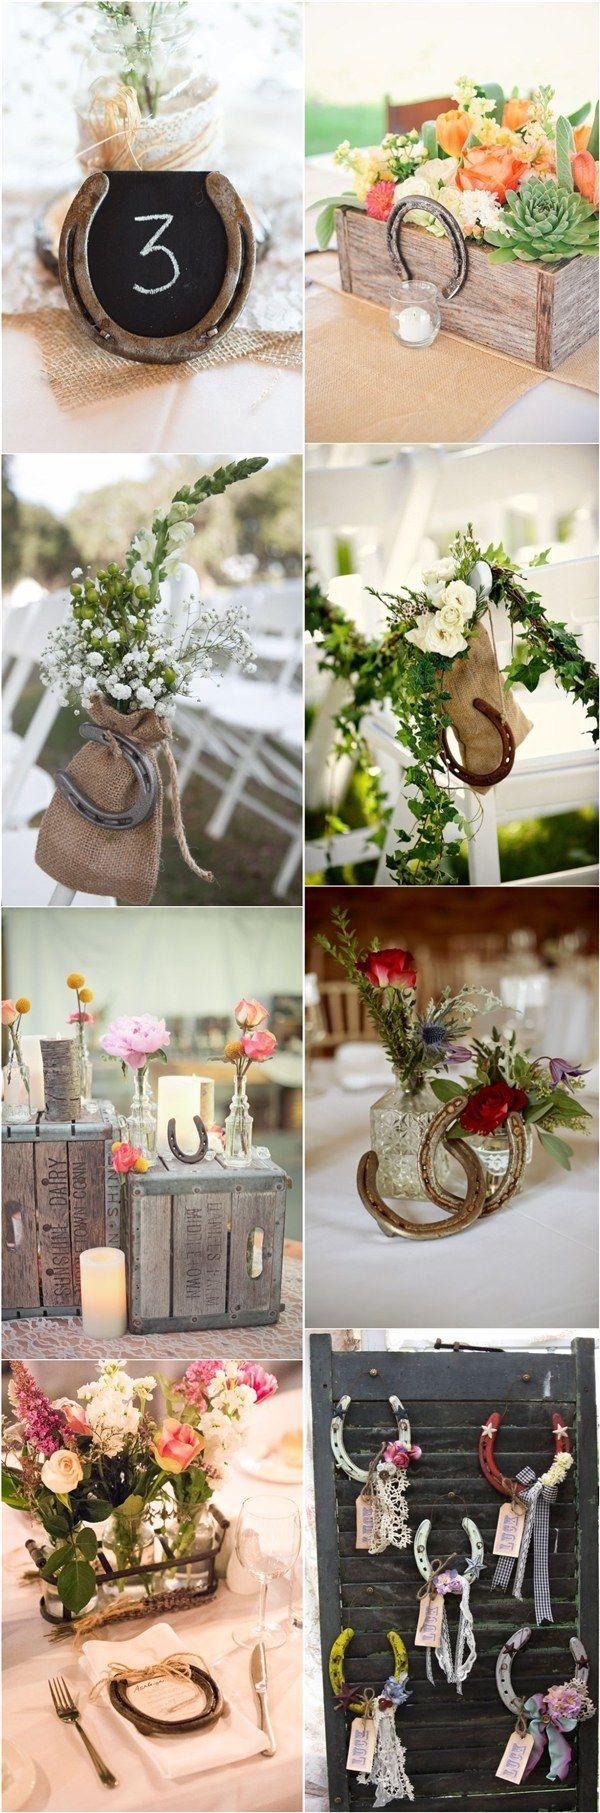 Farm wedding decor ideas   Romantic Wedding Send Off Toss Ideas  Country farm Farming and